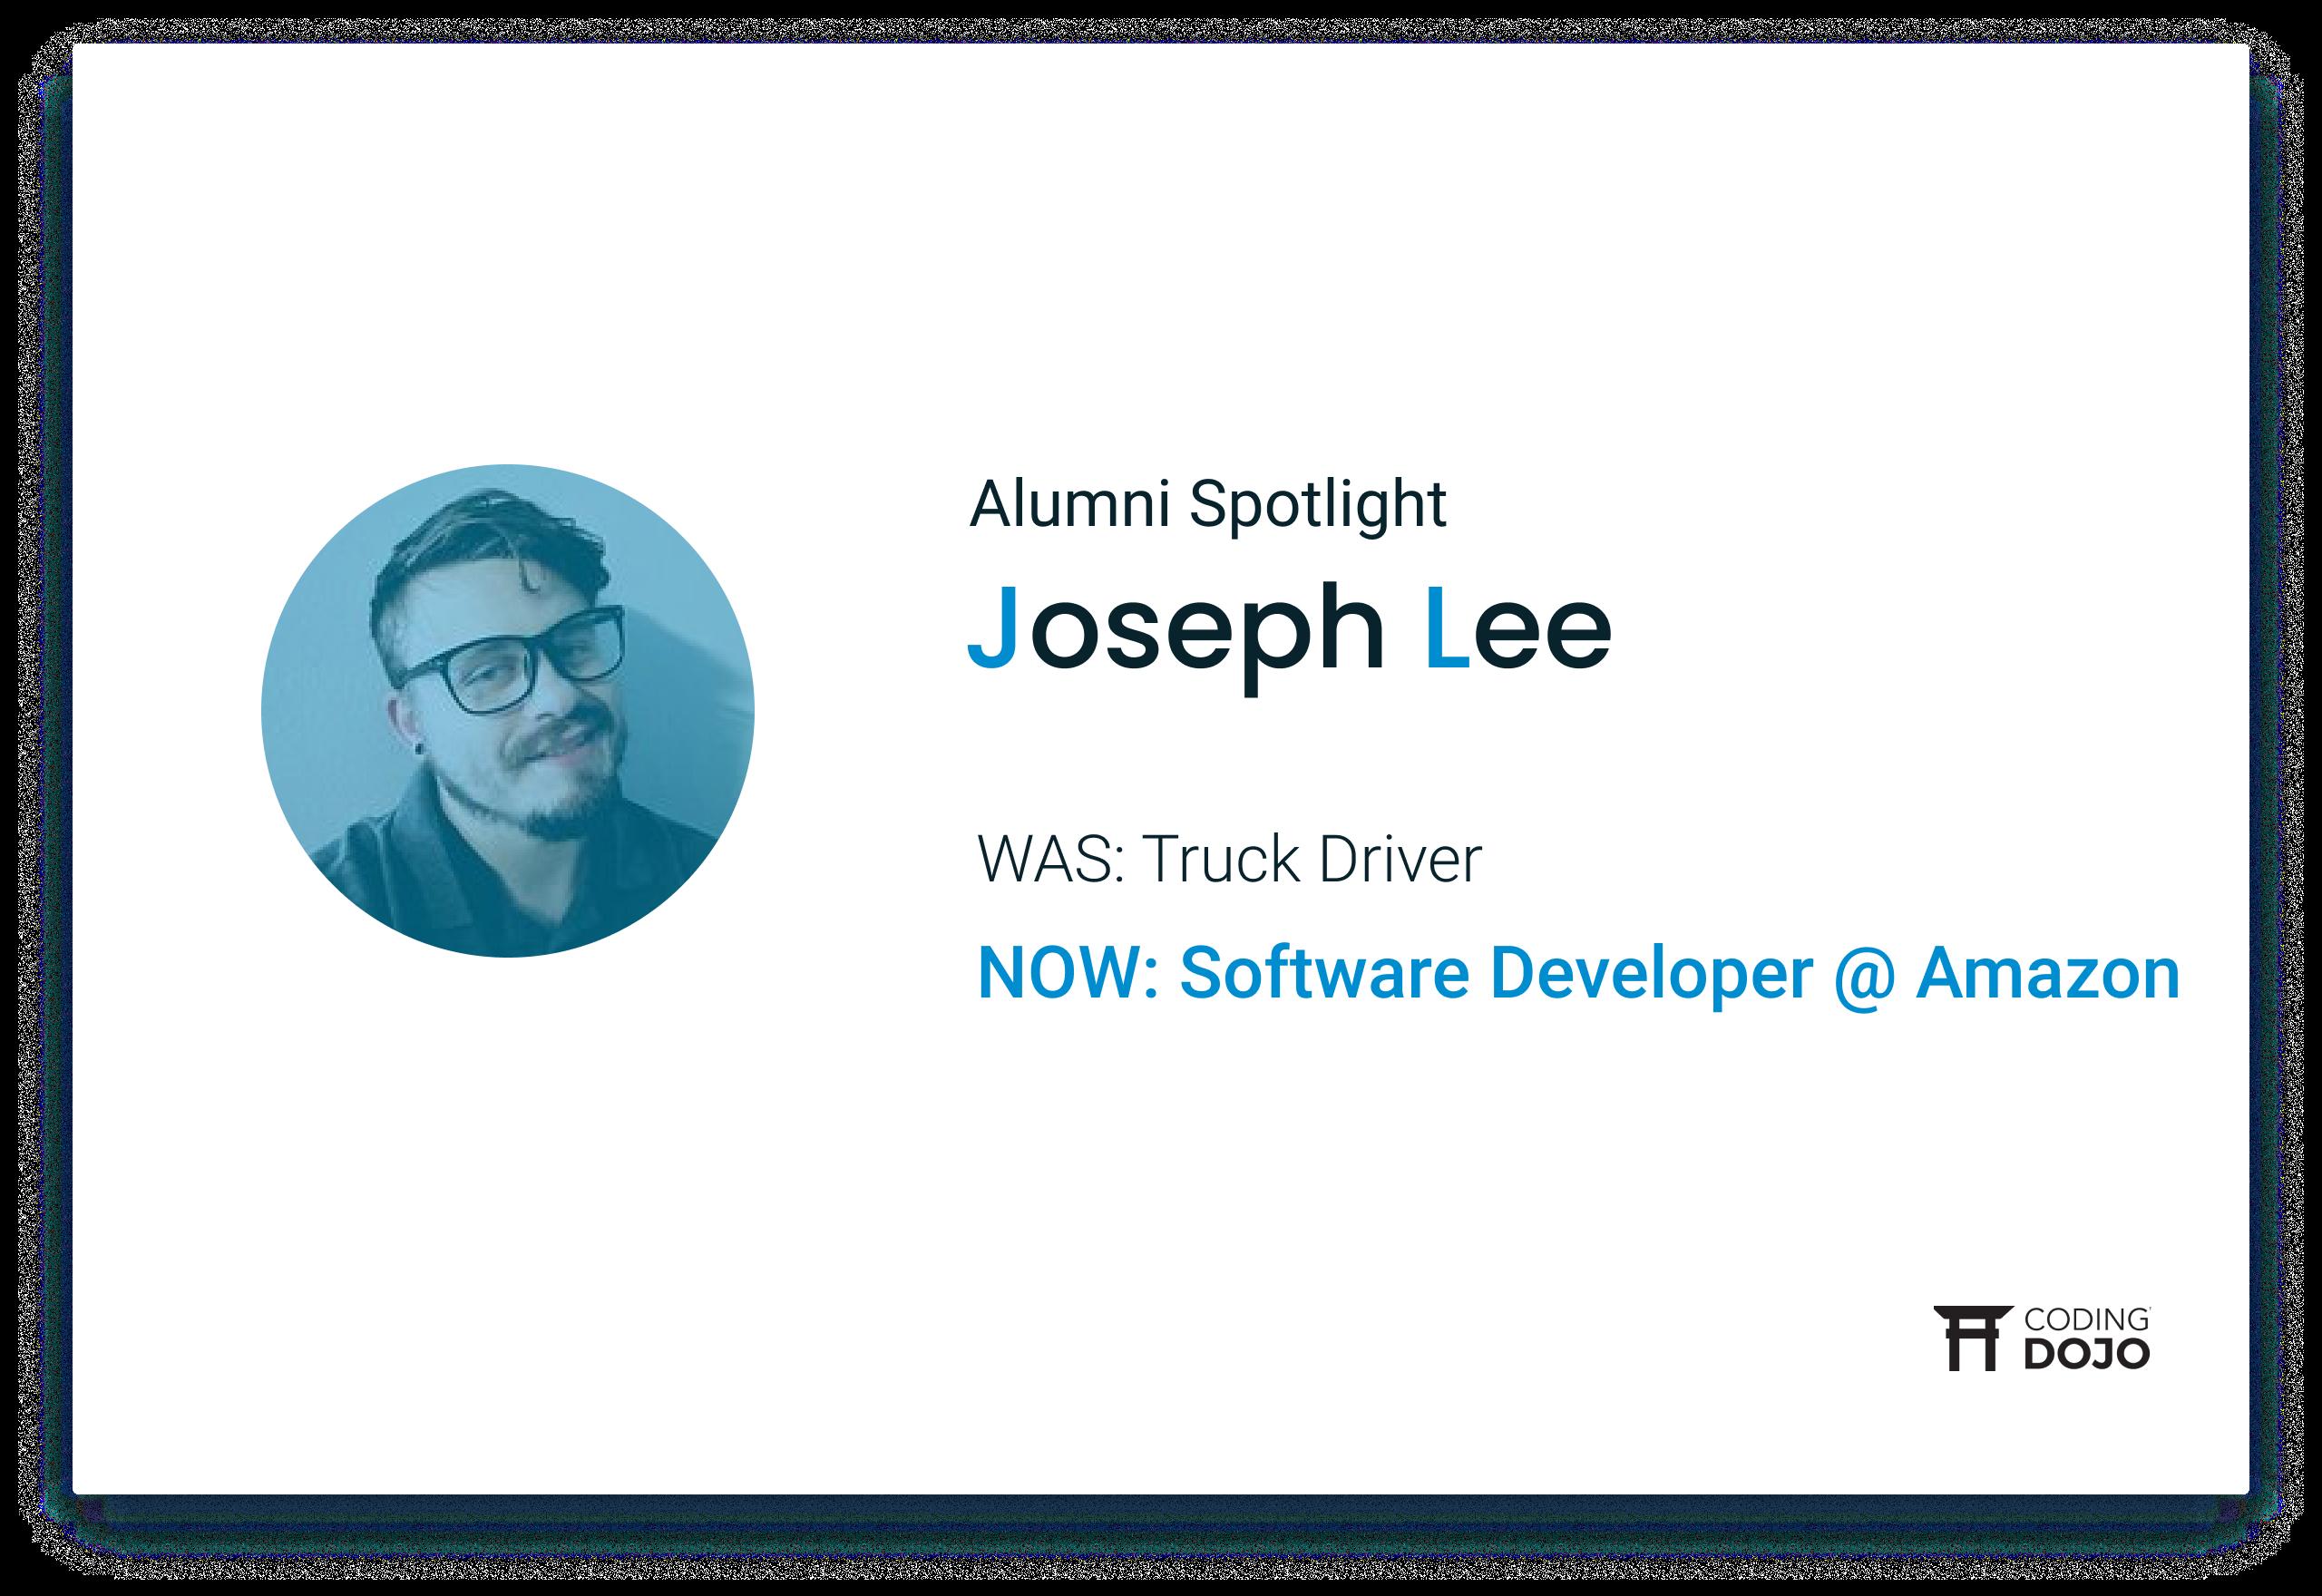 Coding Dojo Alumni Success | Joseph Lee